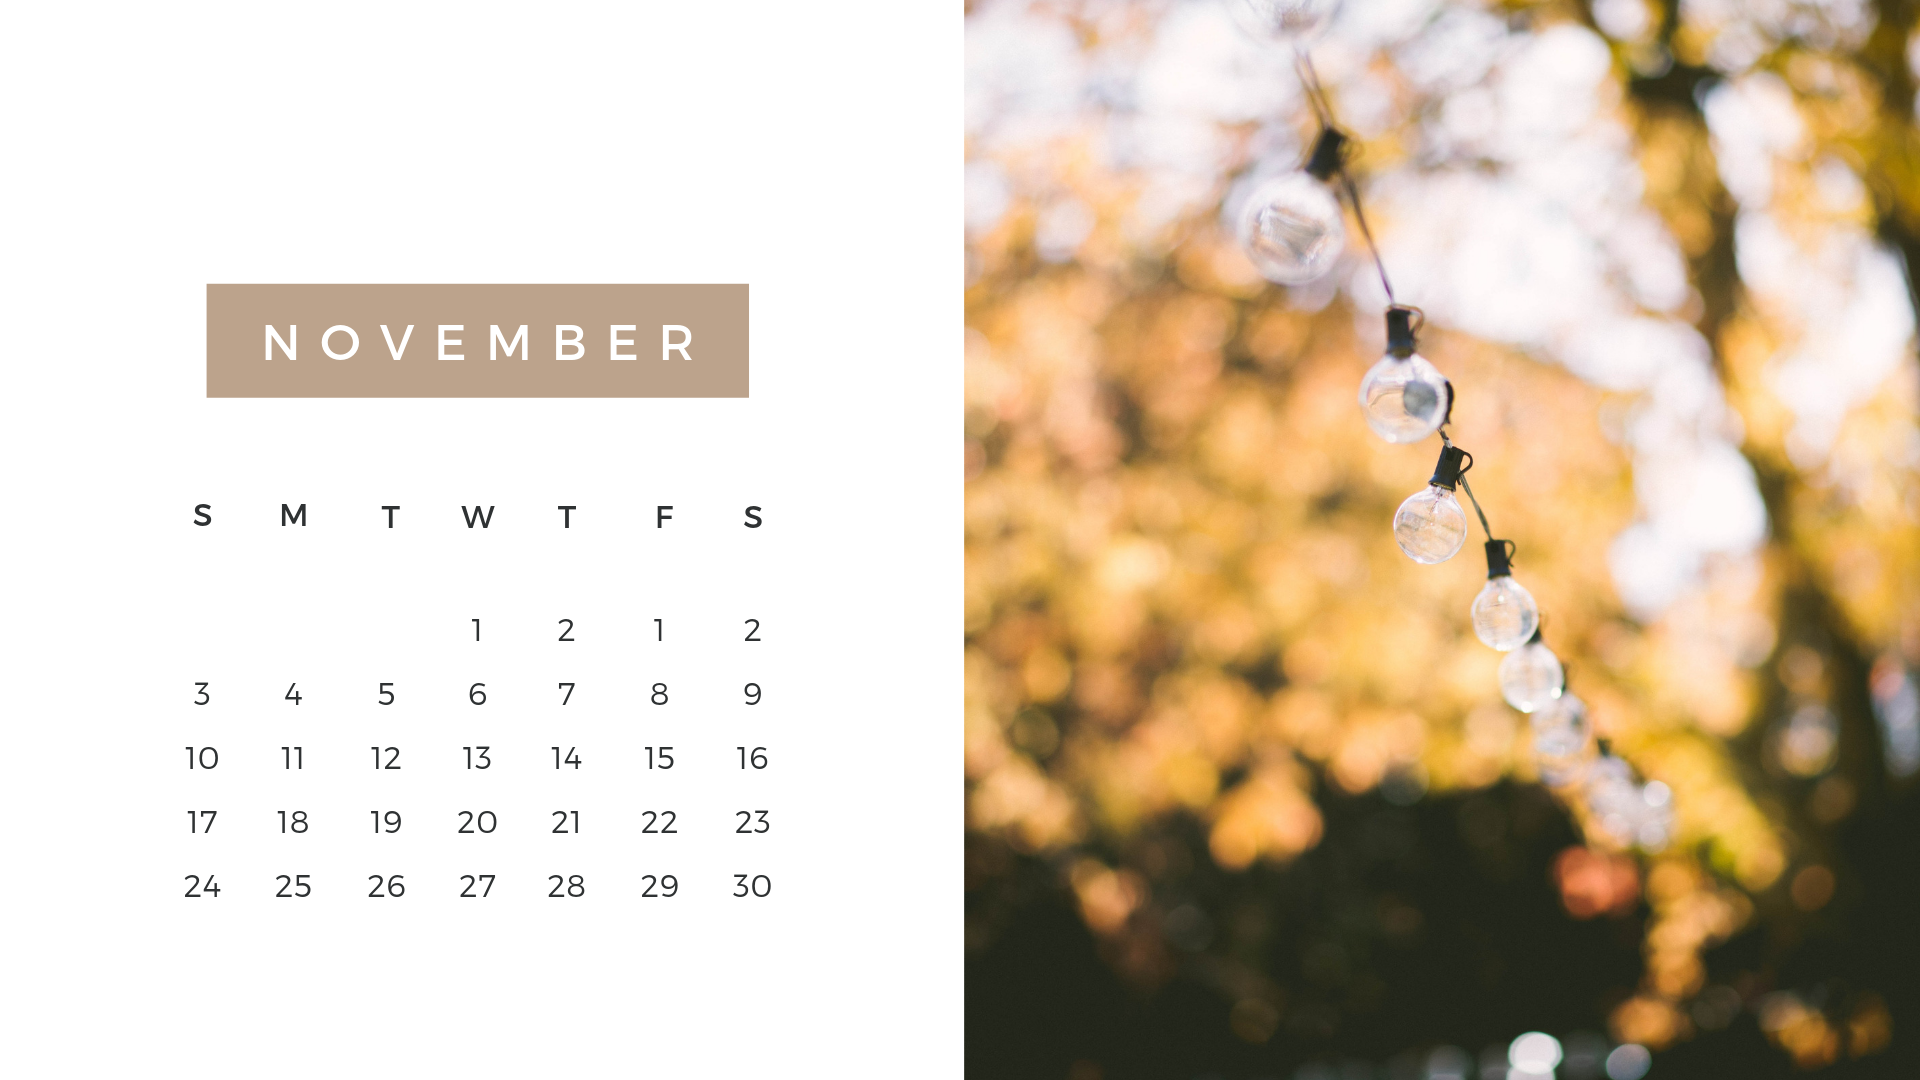 chicago-fall-festival-calendar-november-kourtney-murray-chicago-real-estate.png